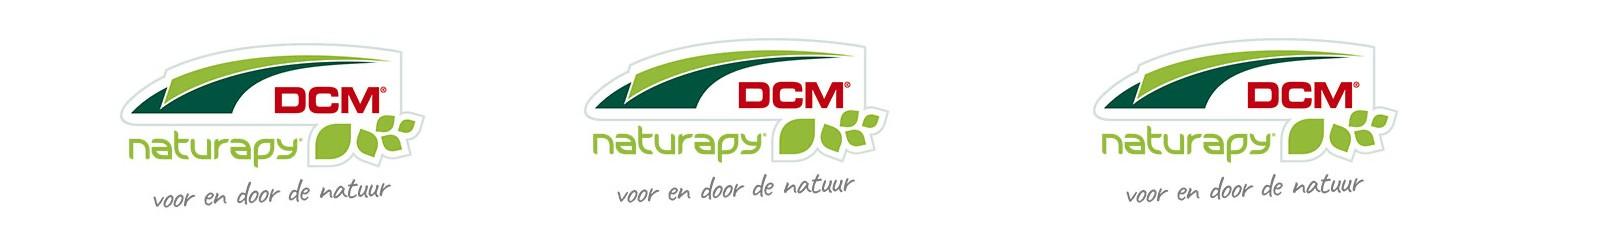 DCM naturapy